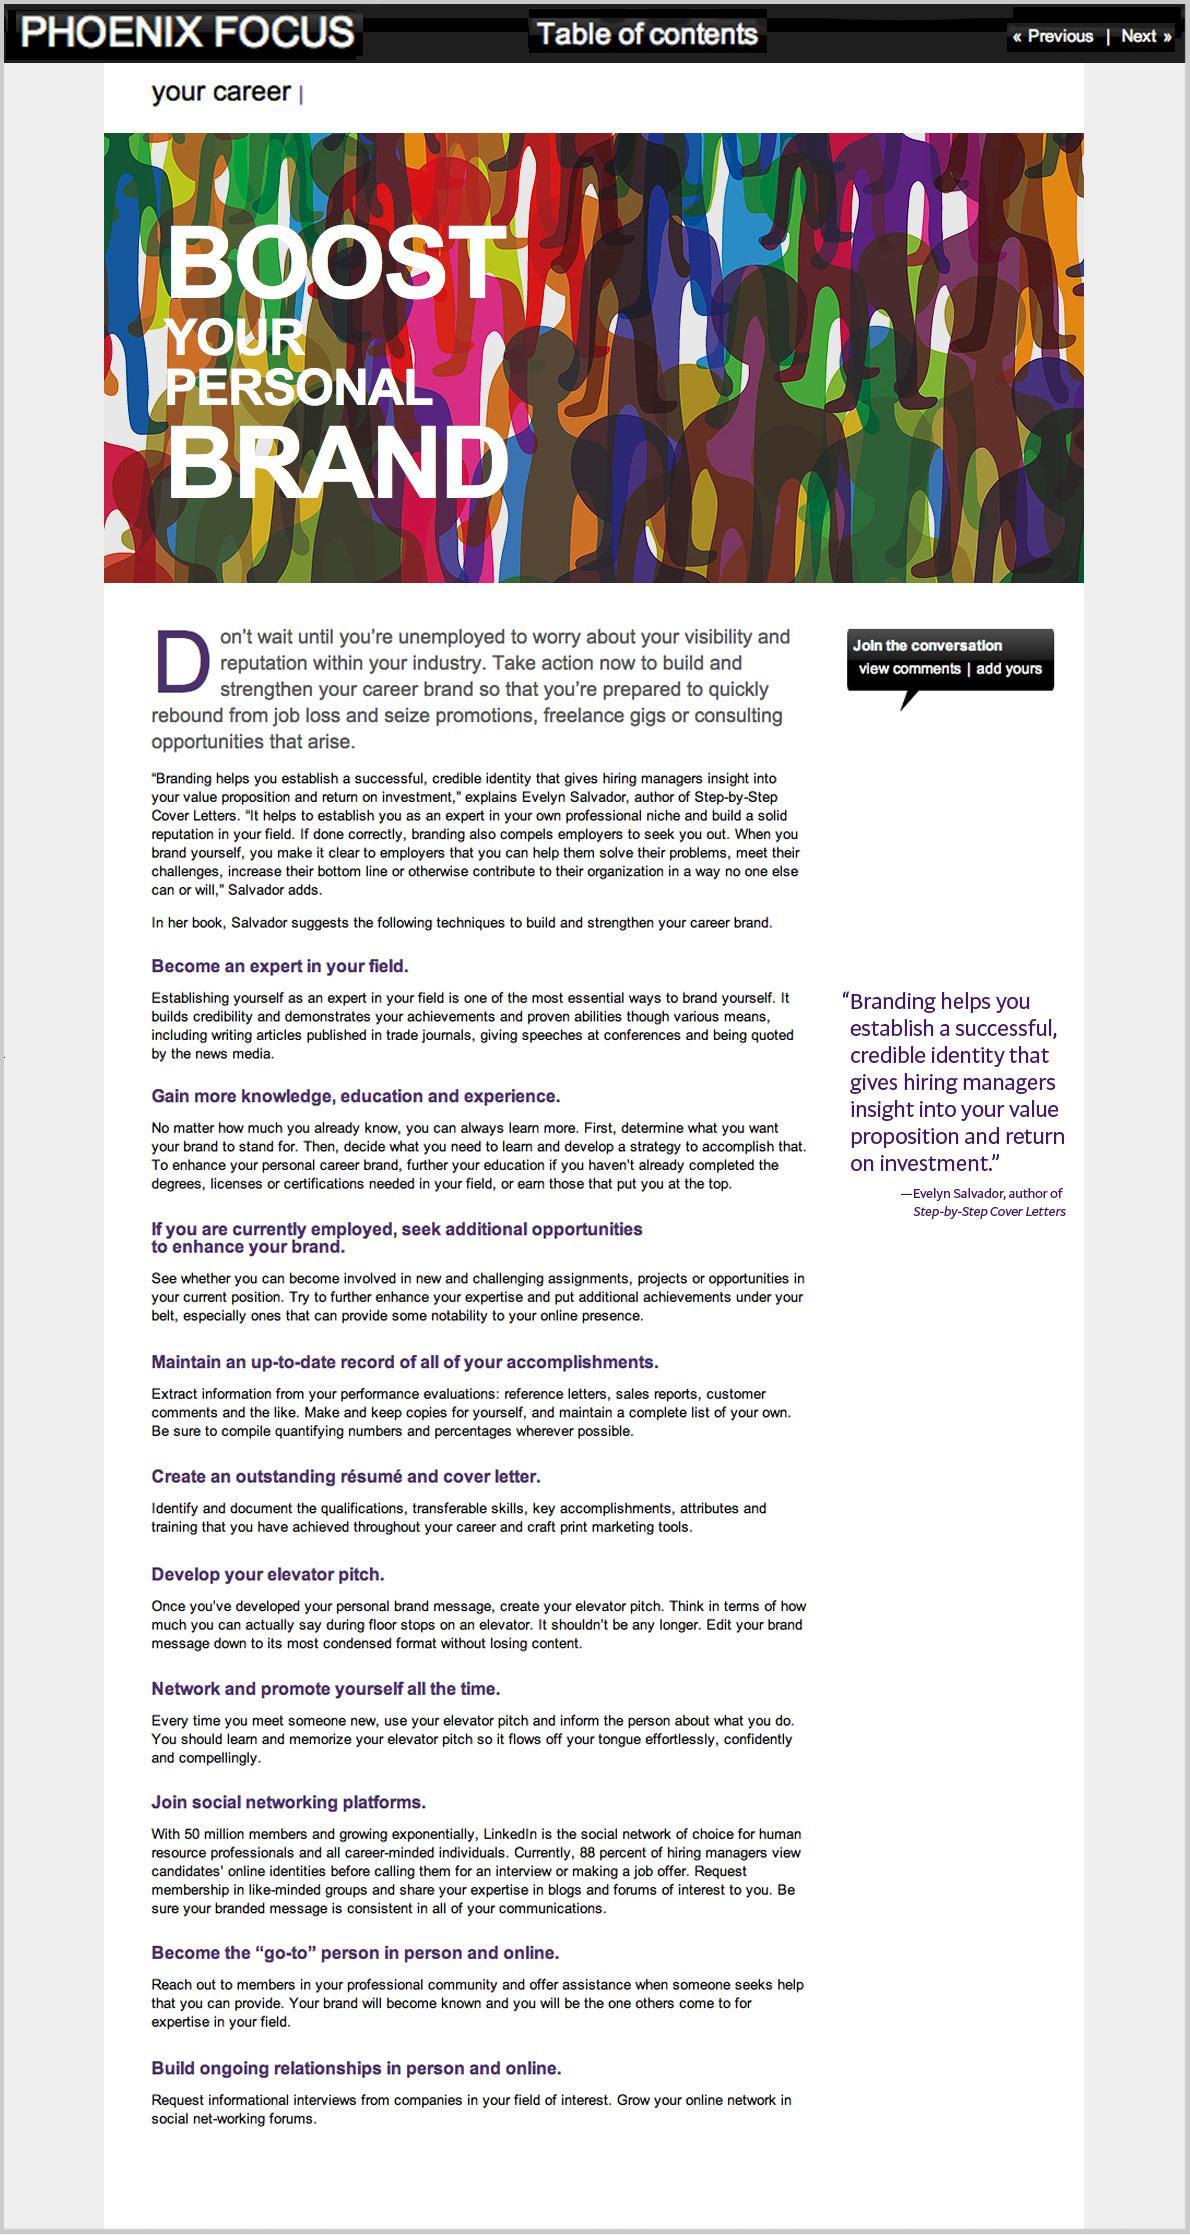 phoenix focus - boost your personal brand.jpg